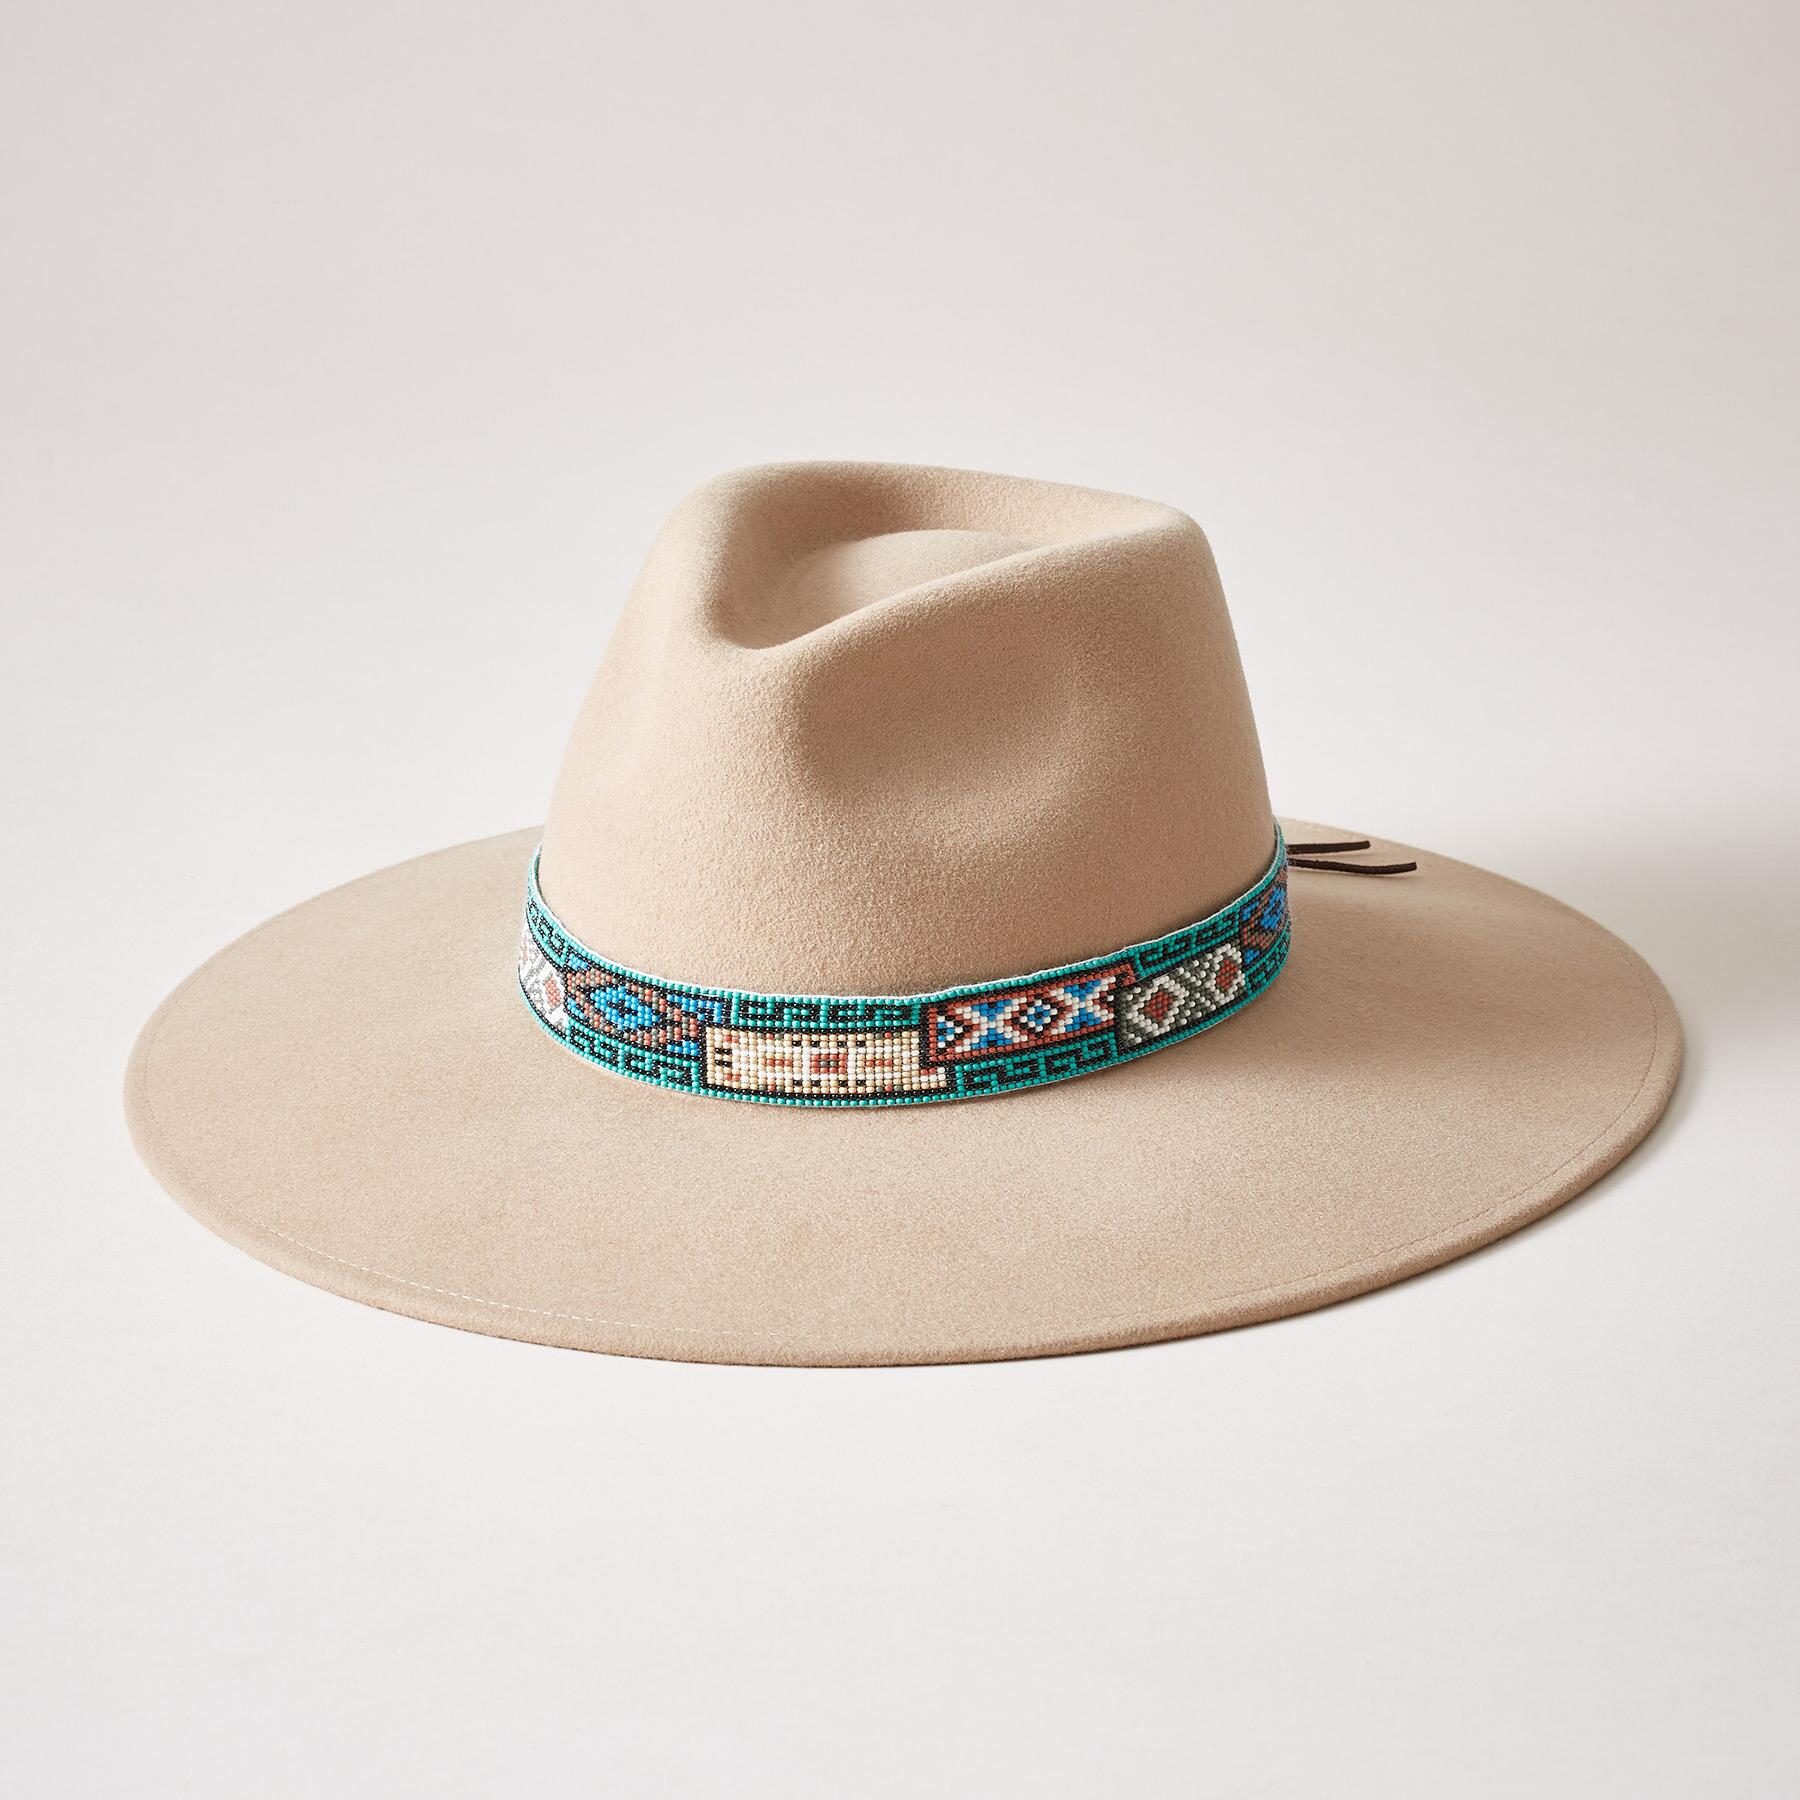 AZTEC BEADED HAT: View 1